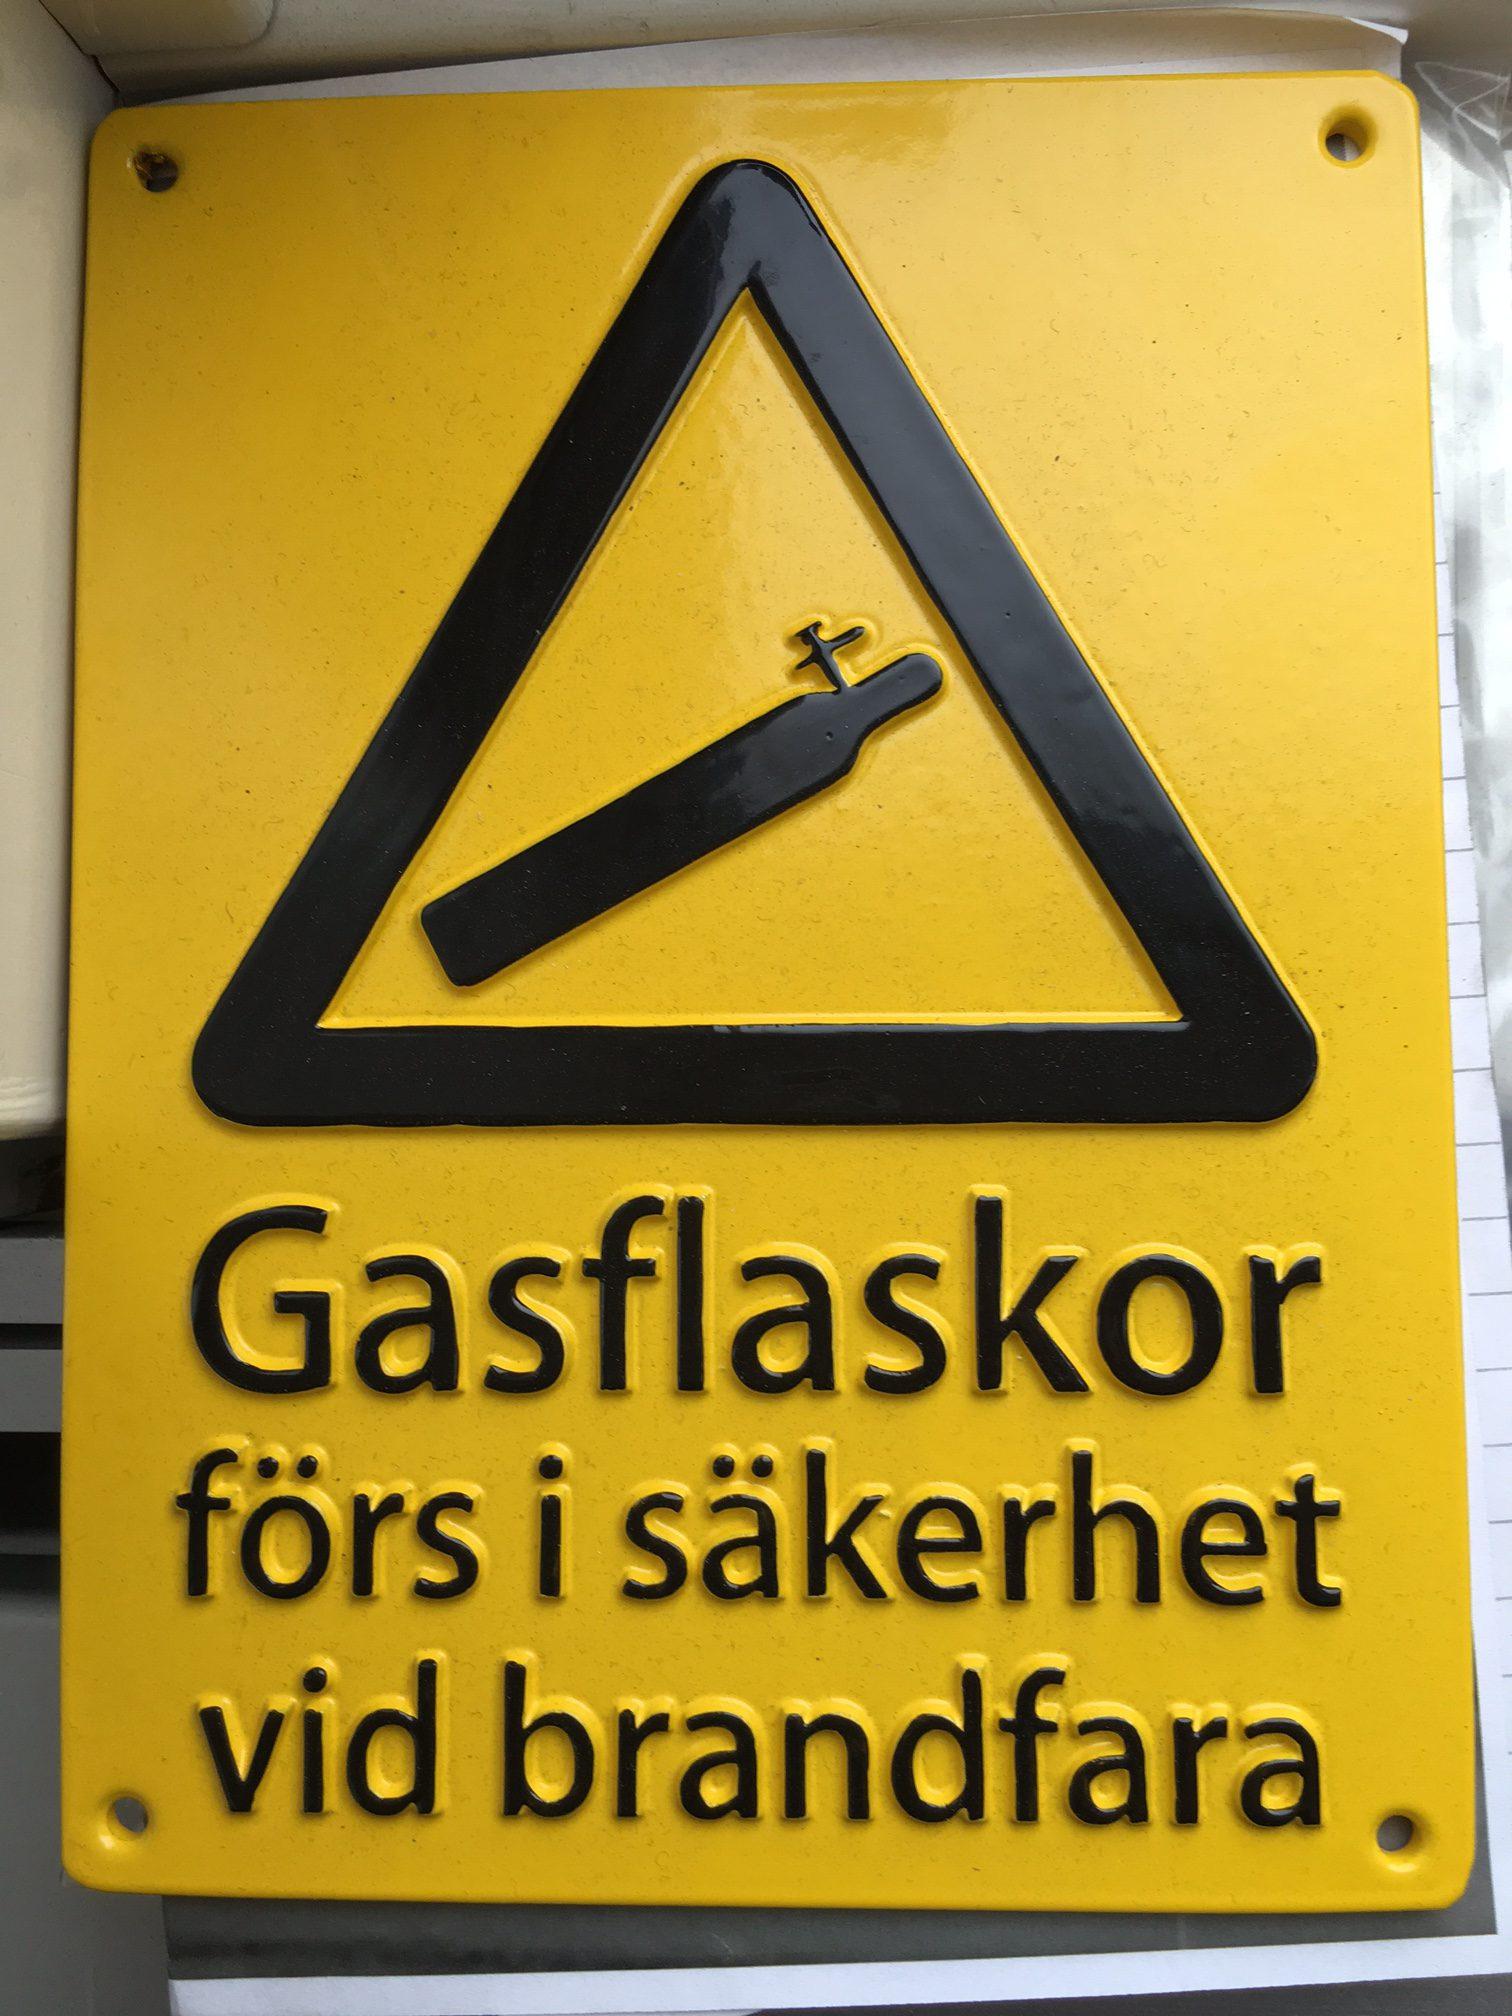 Gasflaskor